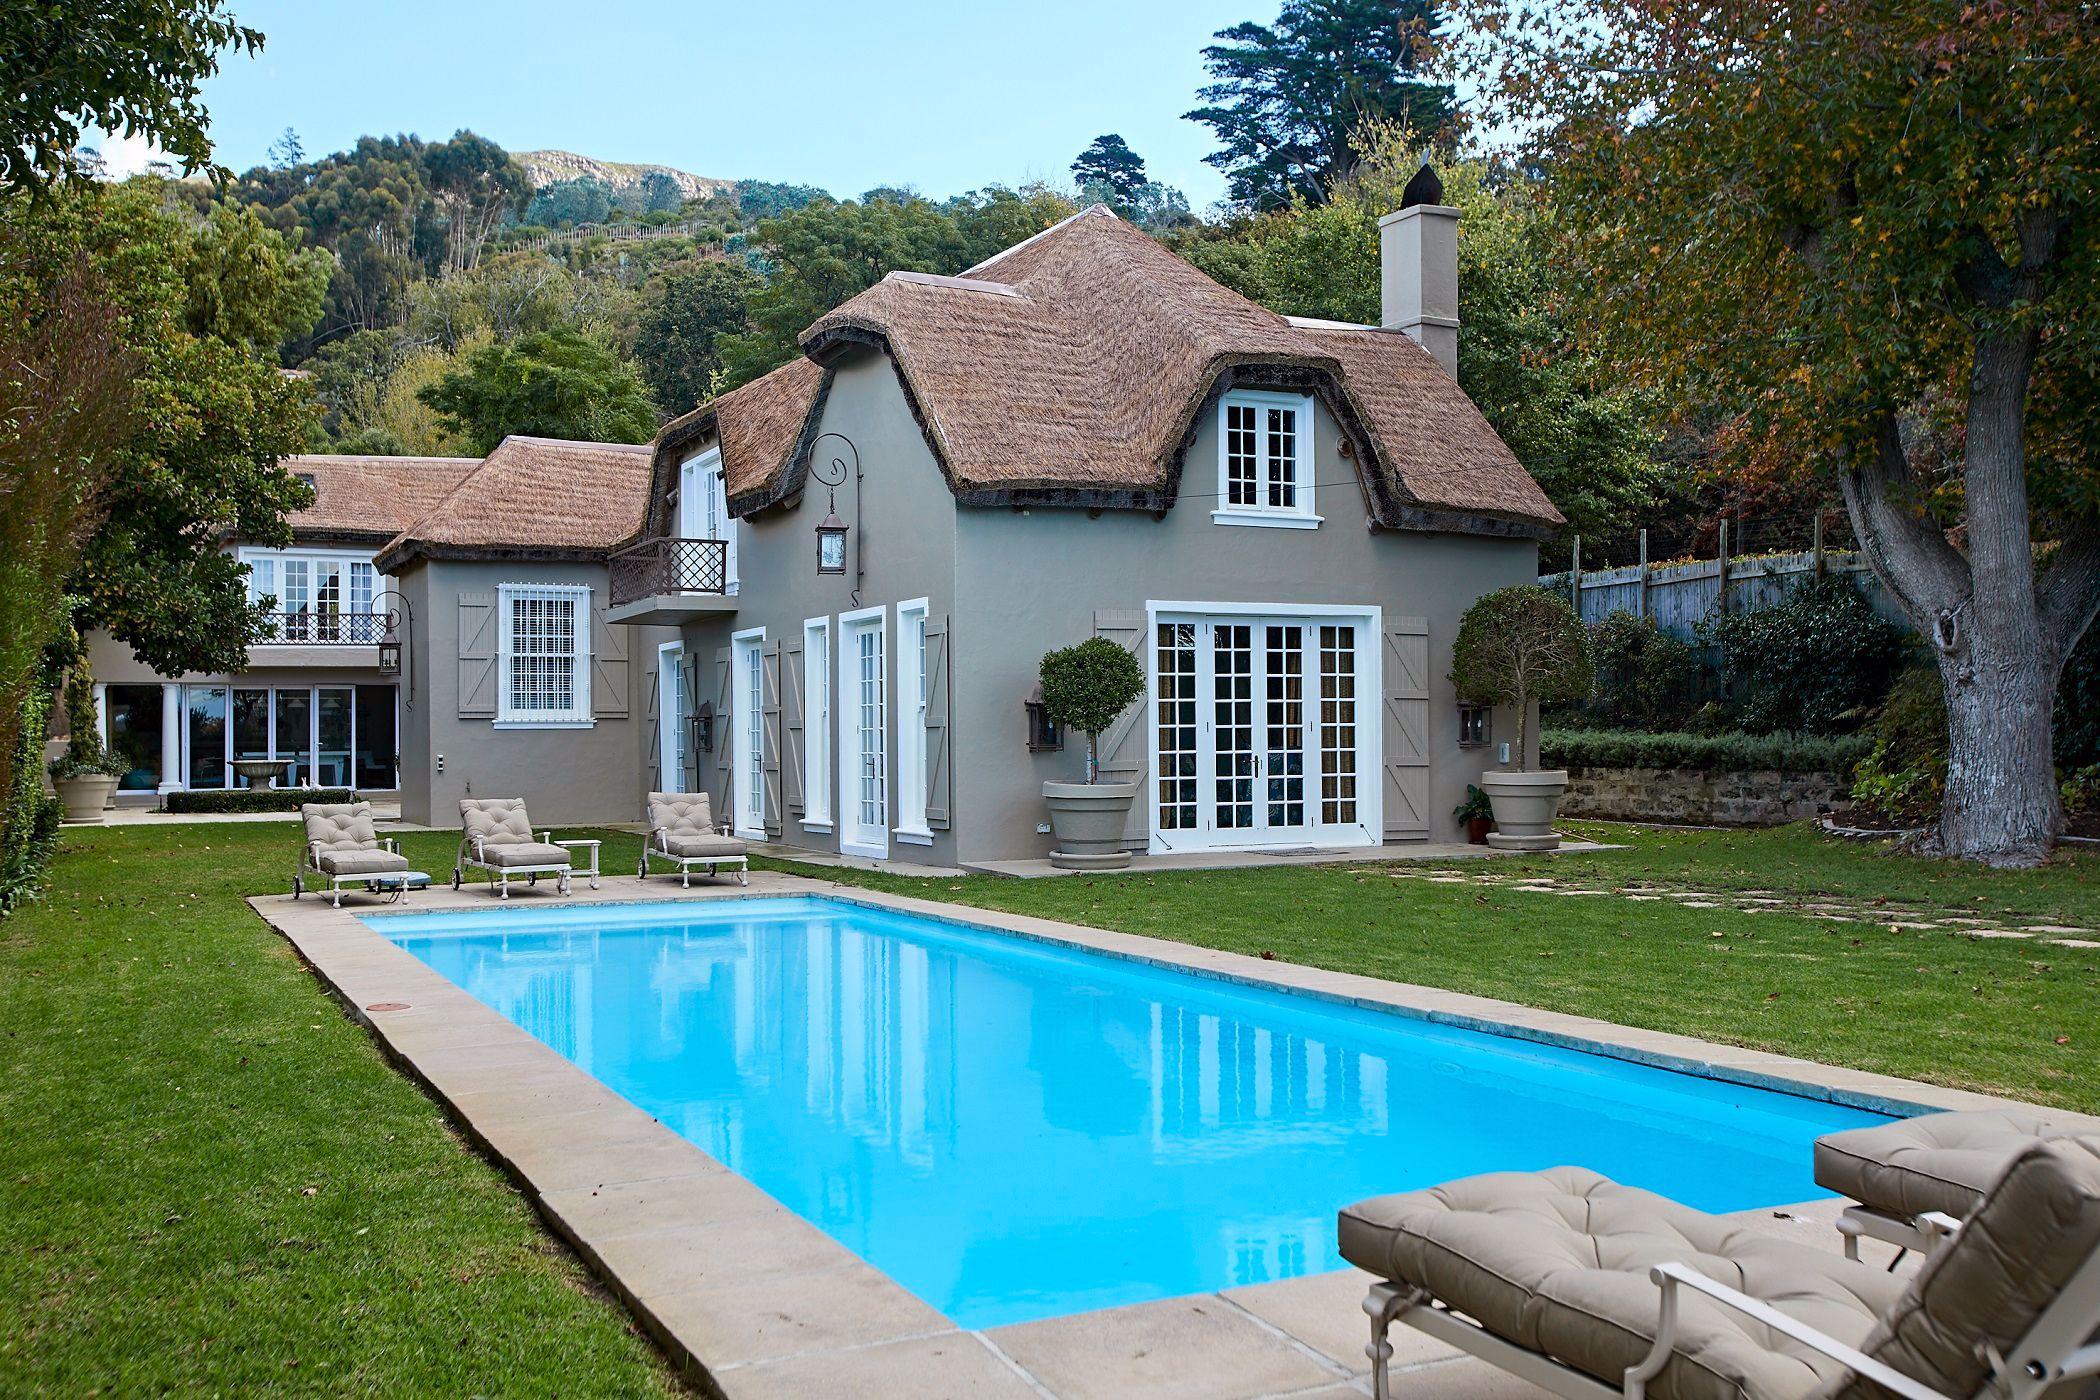 5 bedroom house to rent in Constantia (Cape Town)